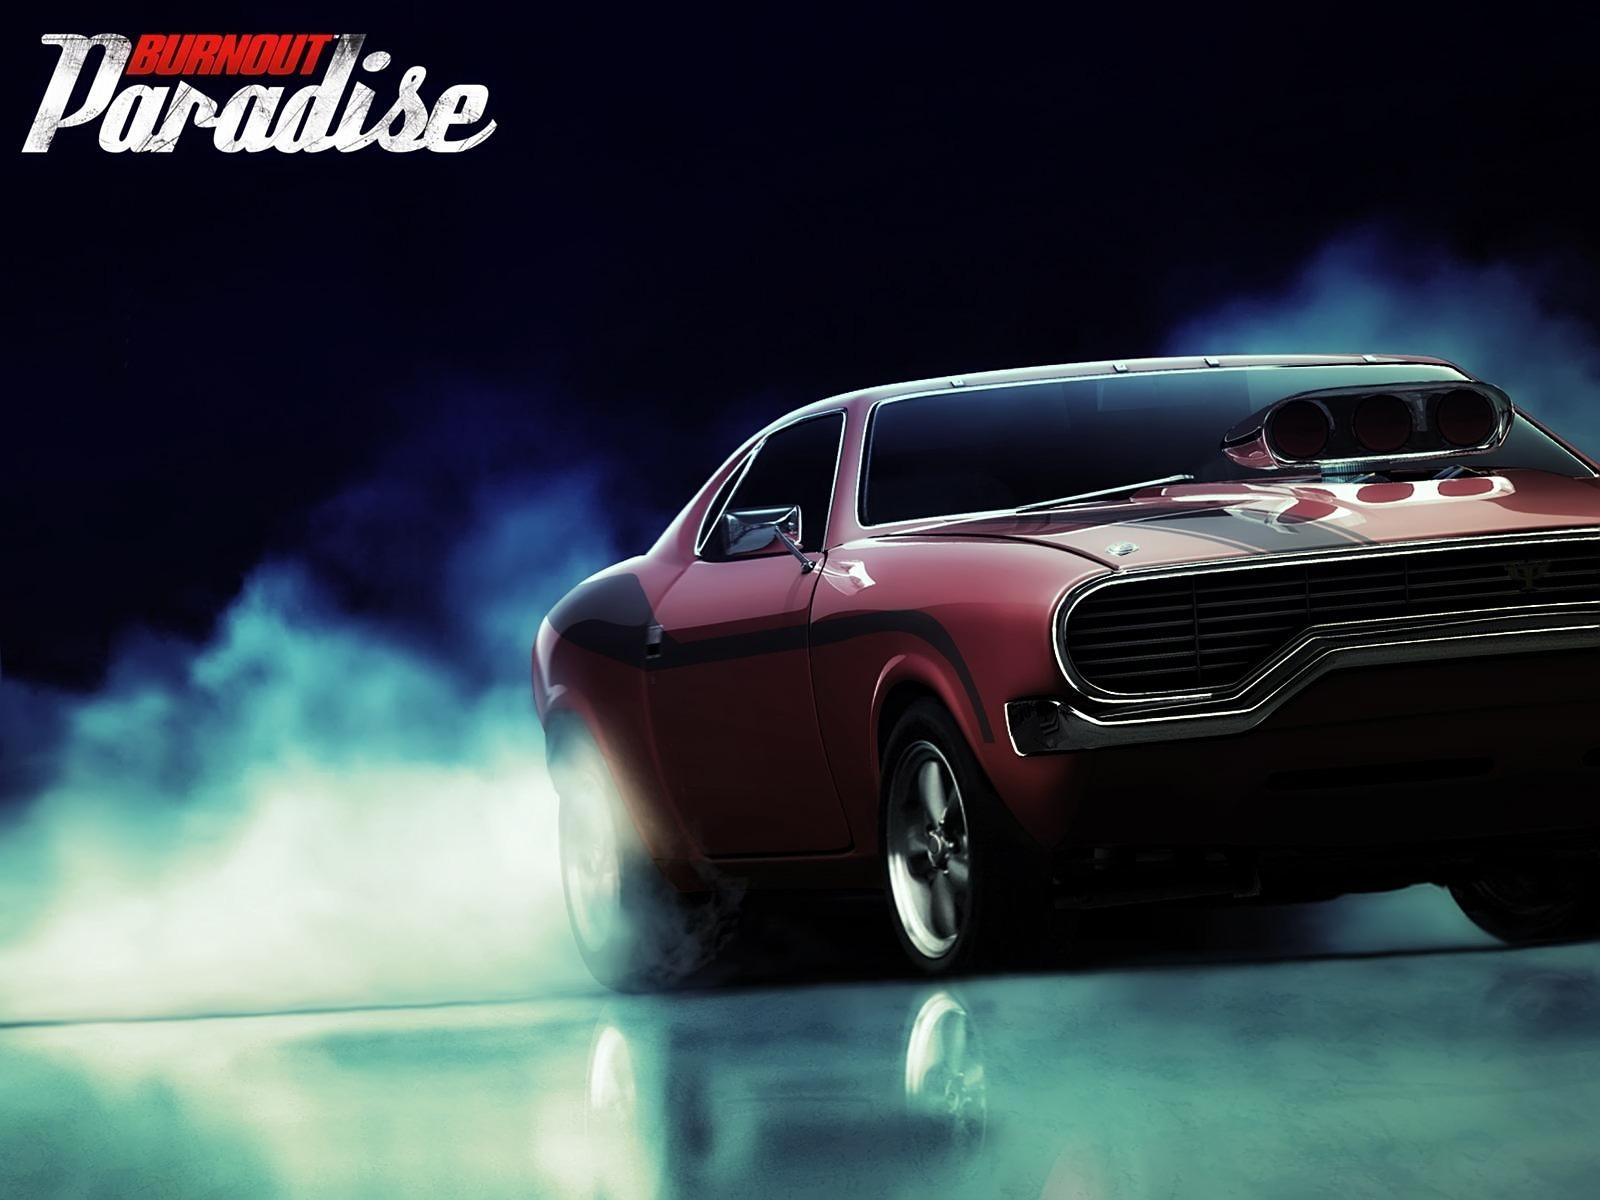 Burnout Paradise HD Wallpapers